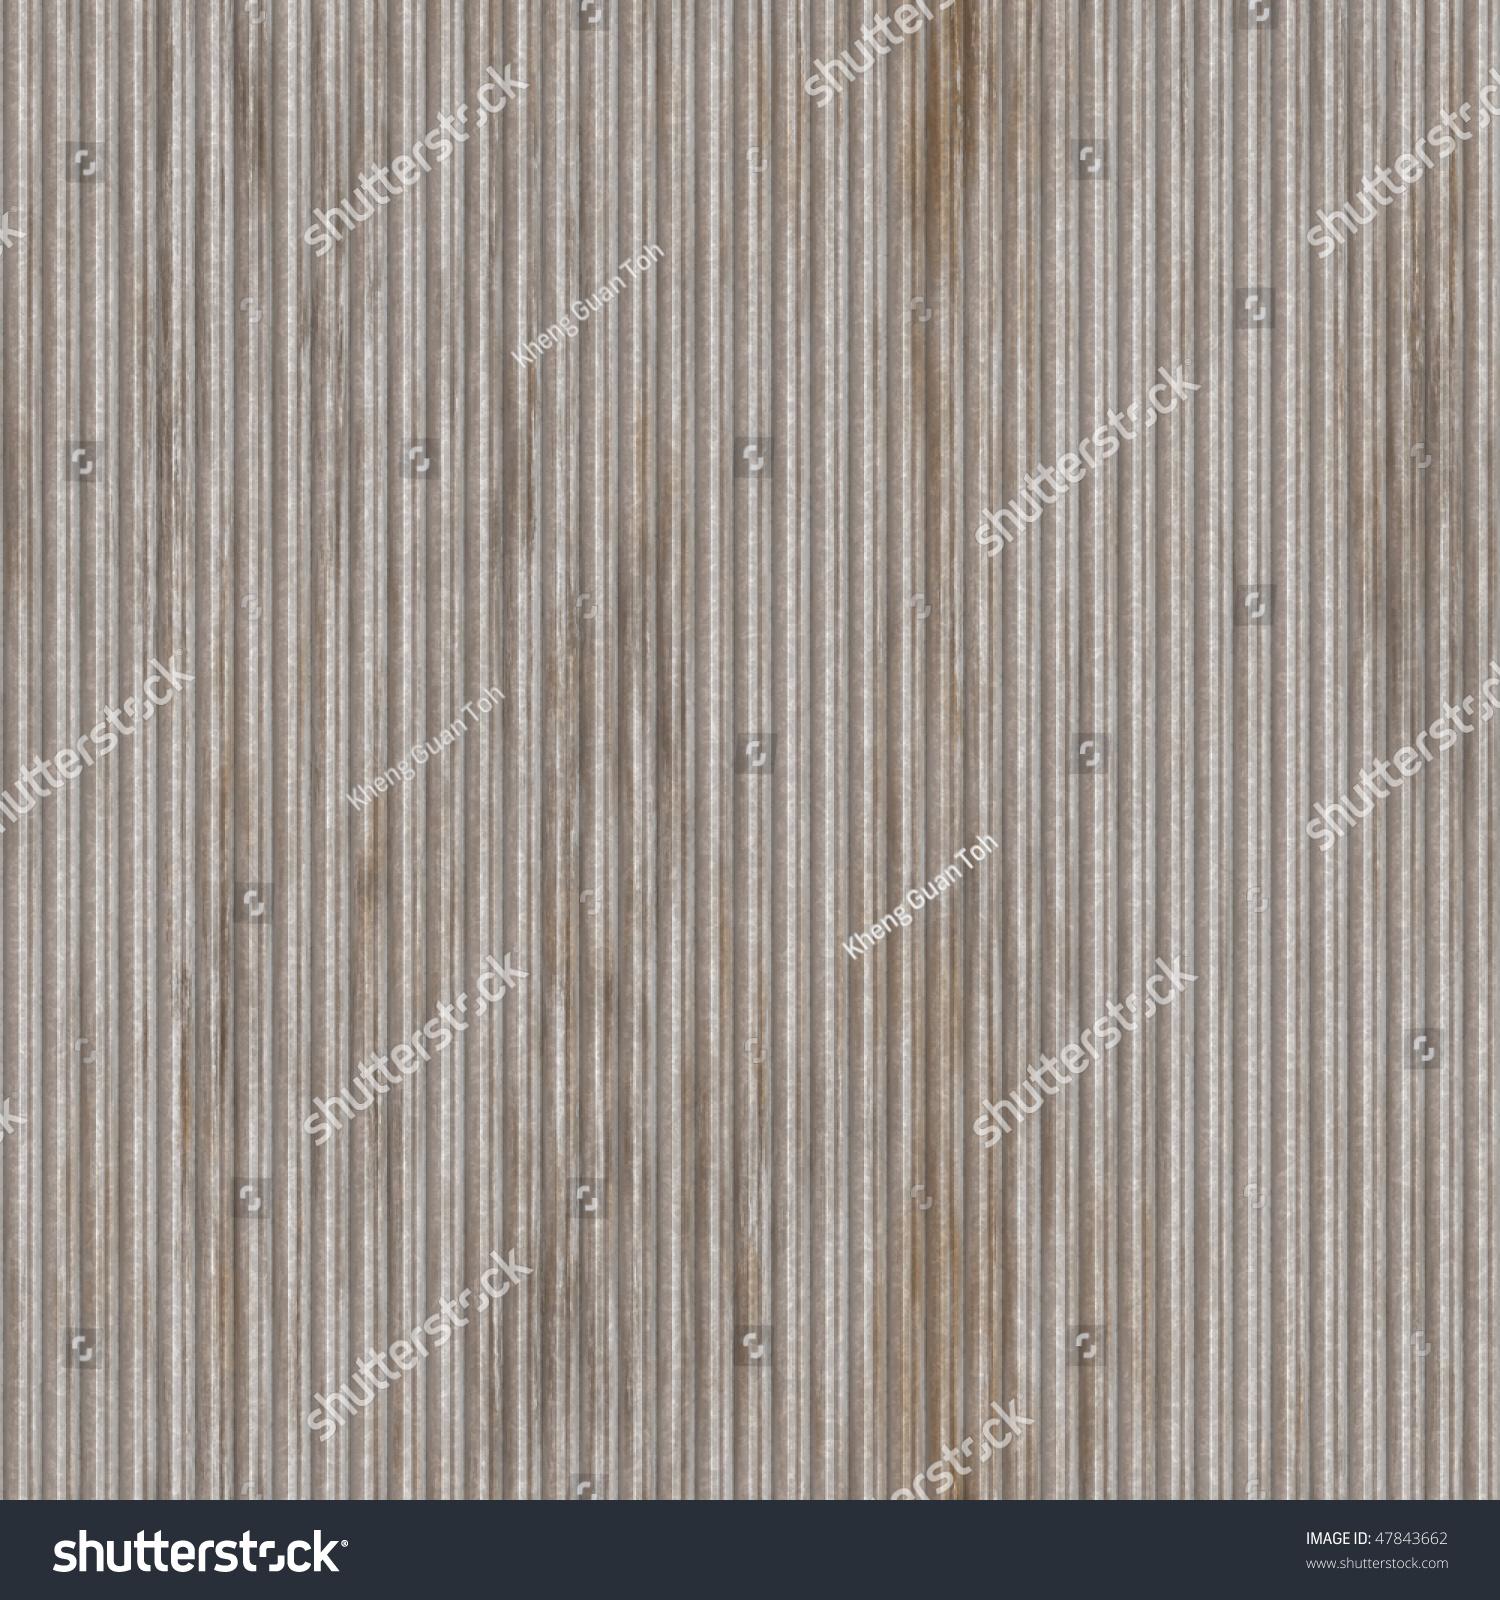 Corrugated Metal Ridged Surface Corrosion Seamless Stock